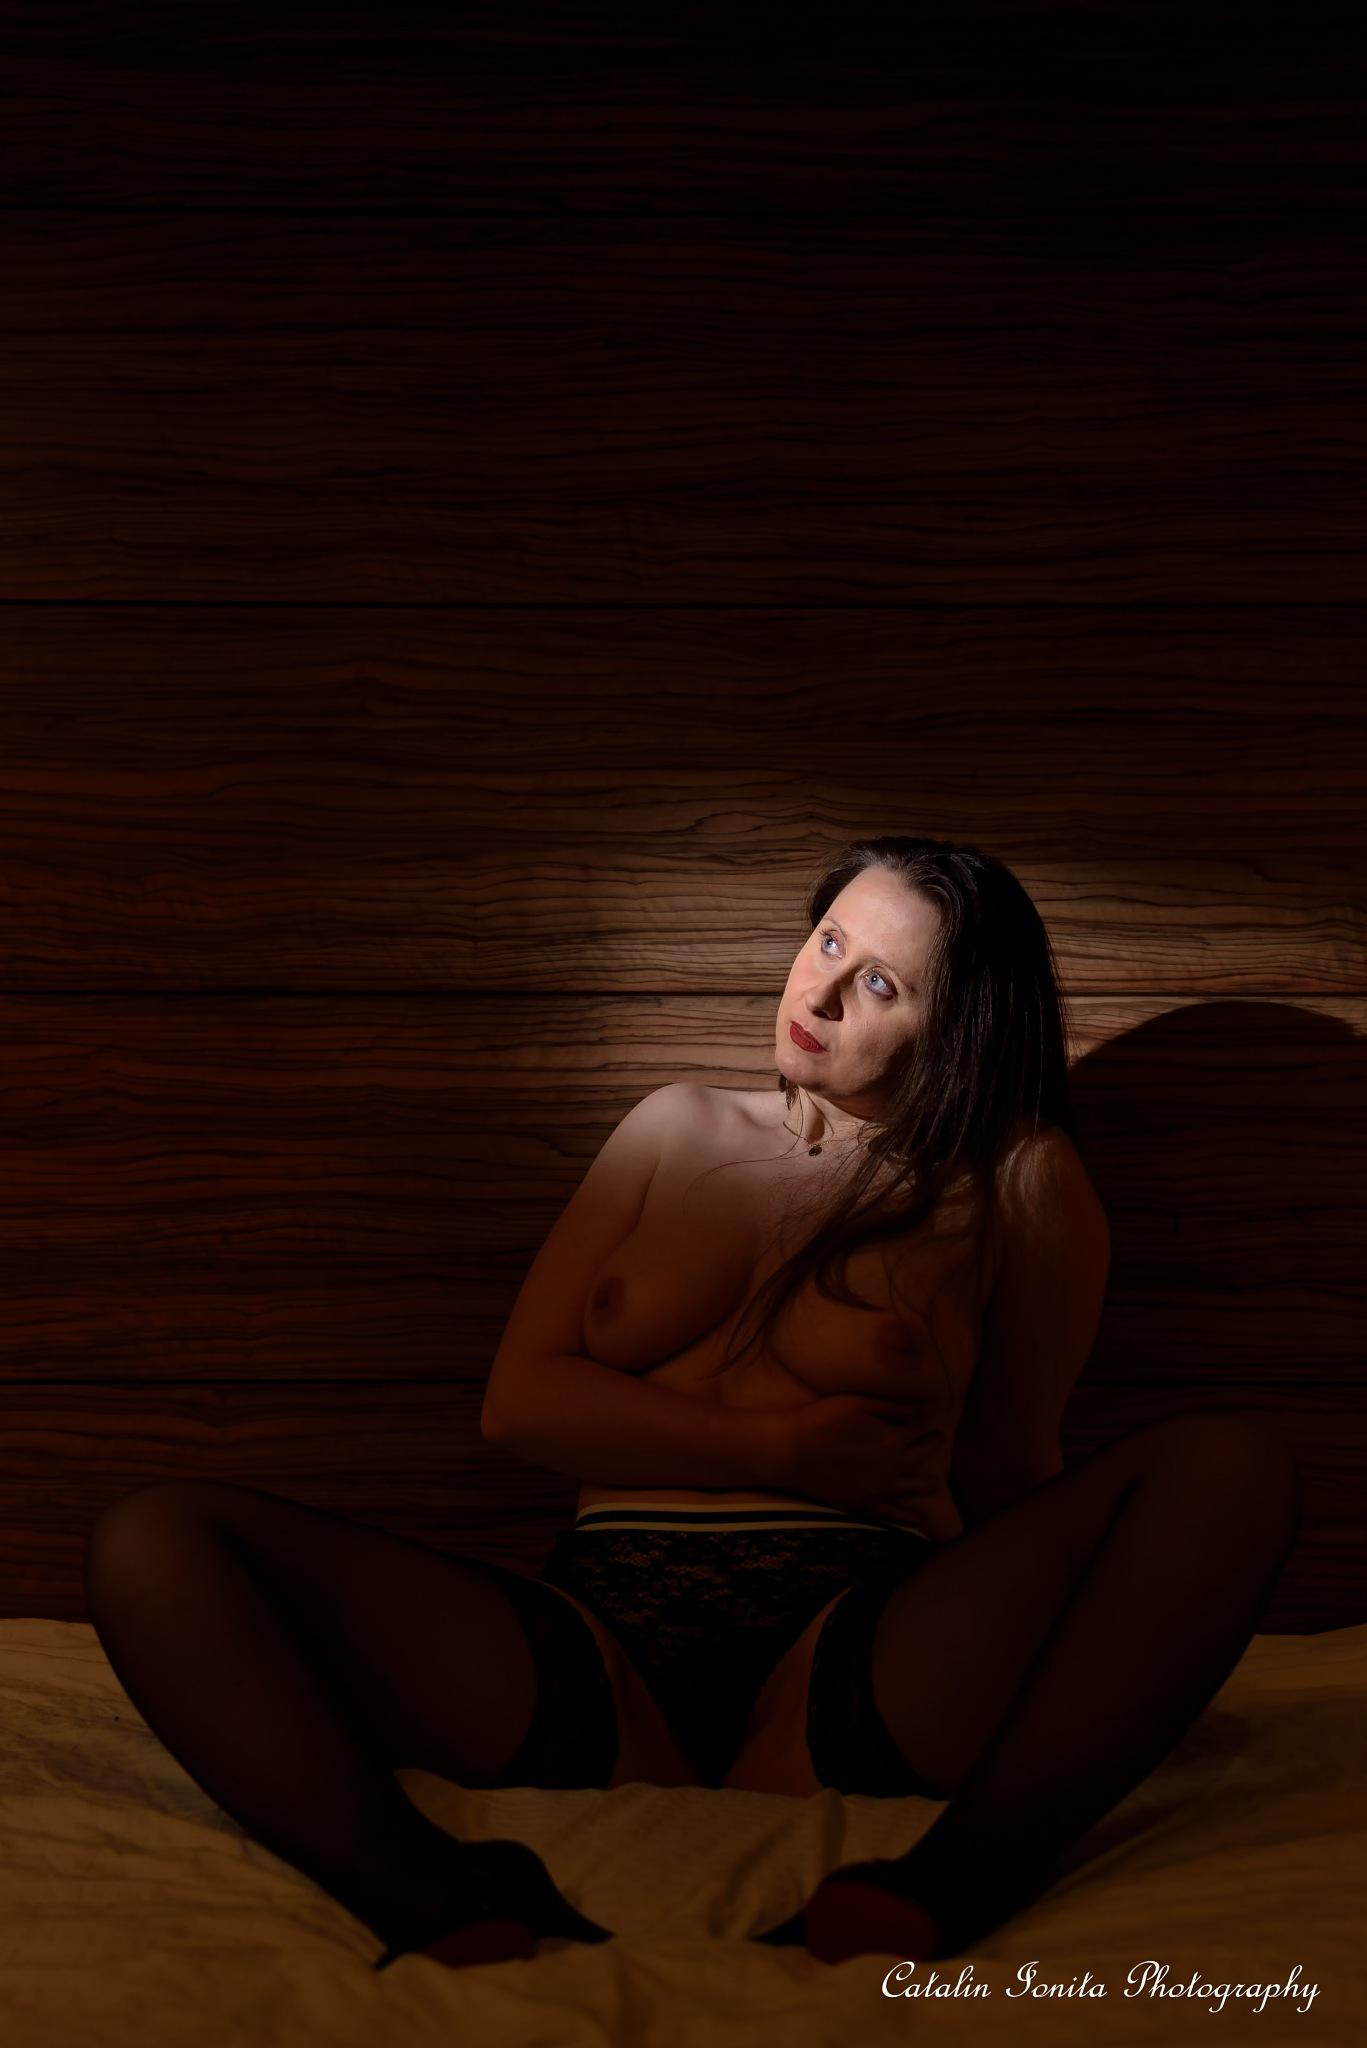 Naughty girl by CatalinIonitaPhotographer